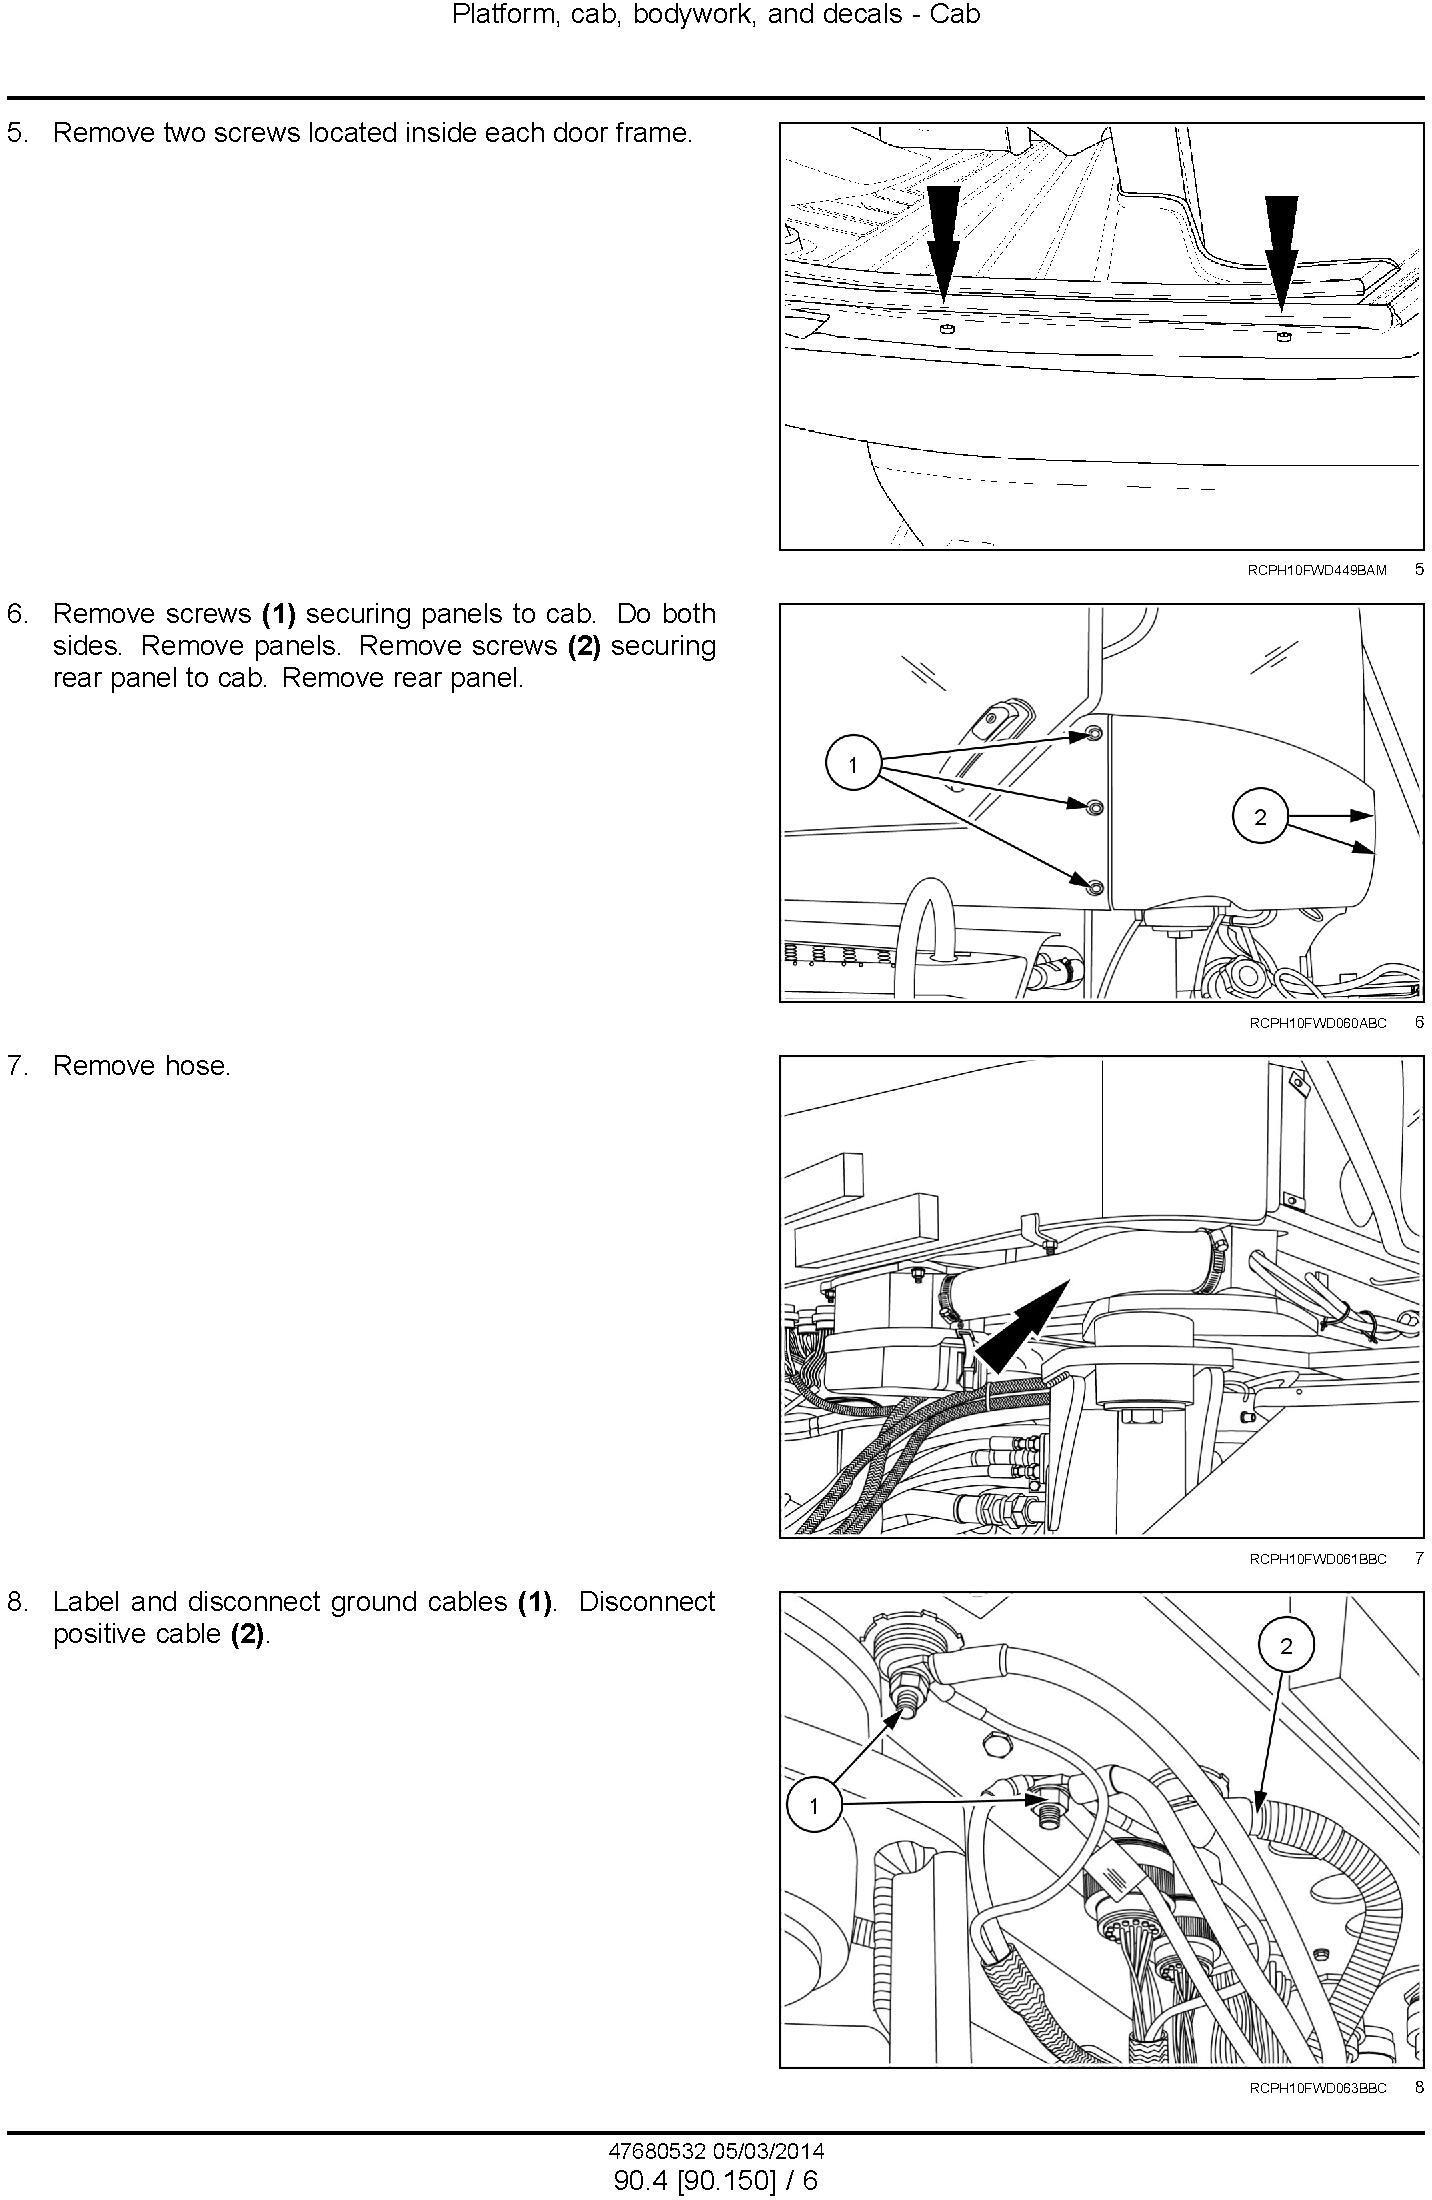 New Holland T9.435, T9.480, T9.530, T9.565, T9.600, T9.645, T9.700 T4B Final USA Tractor Service Manual - 3